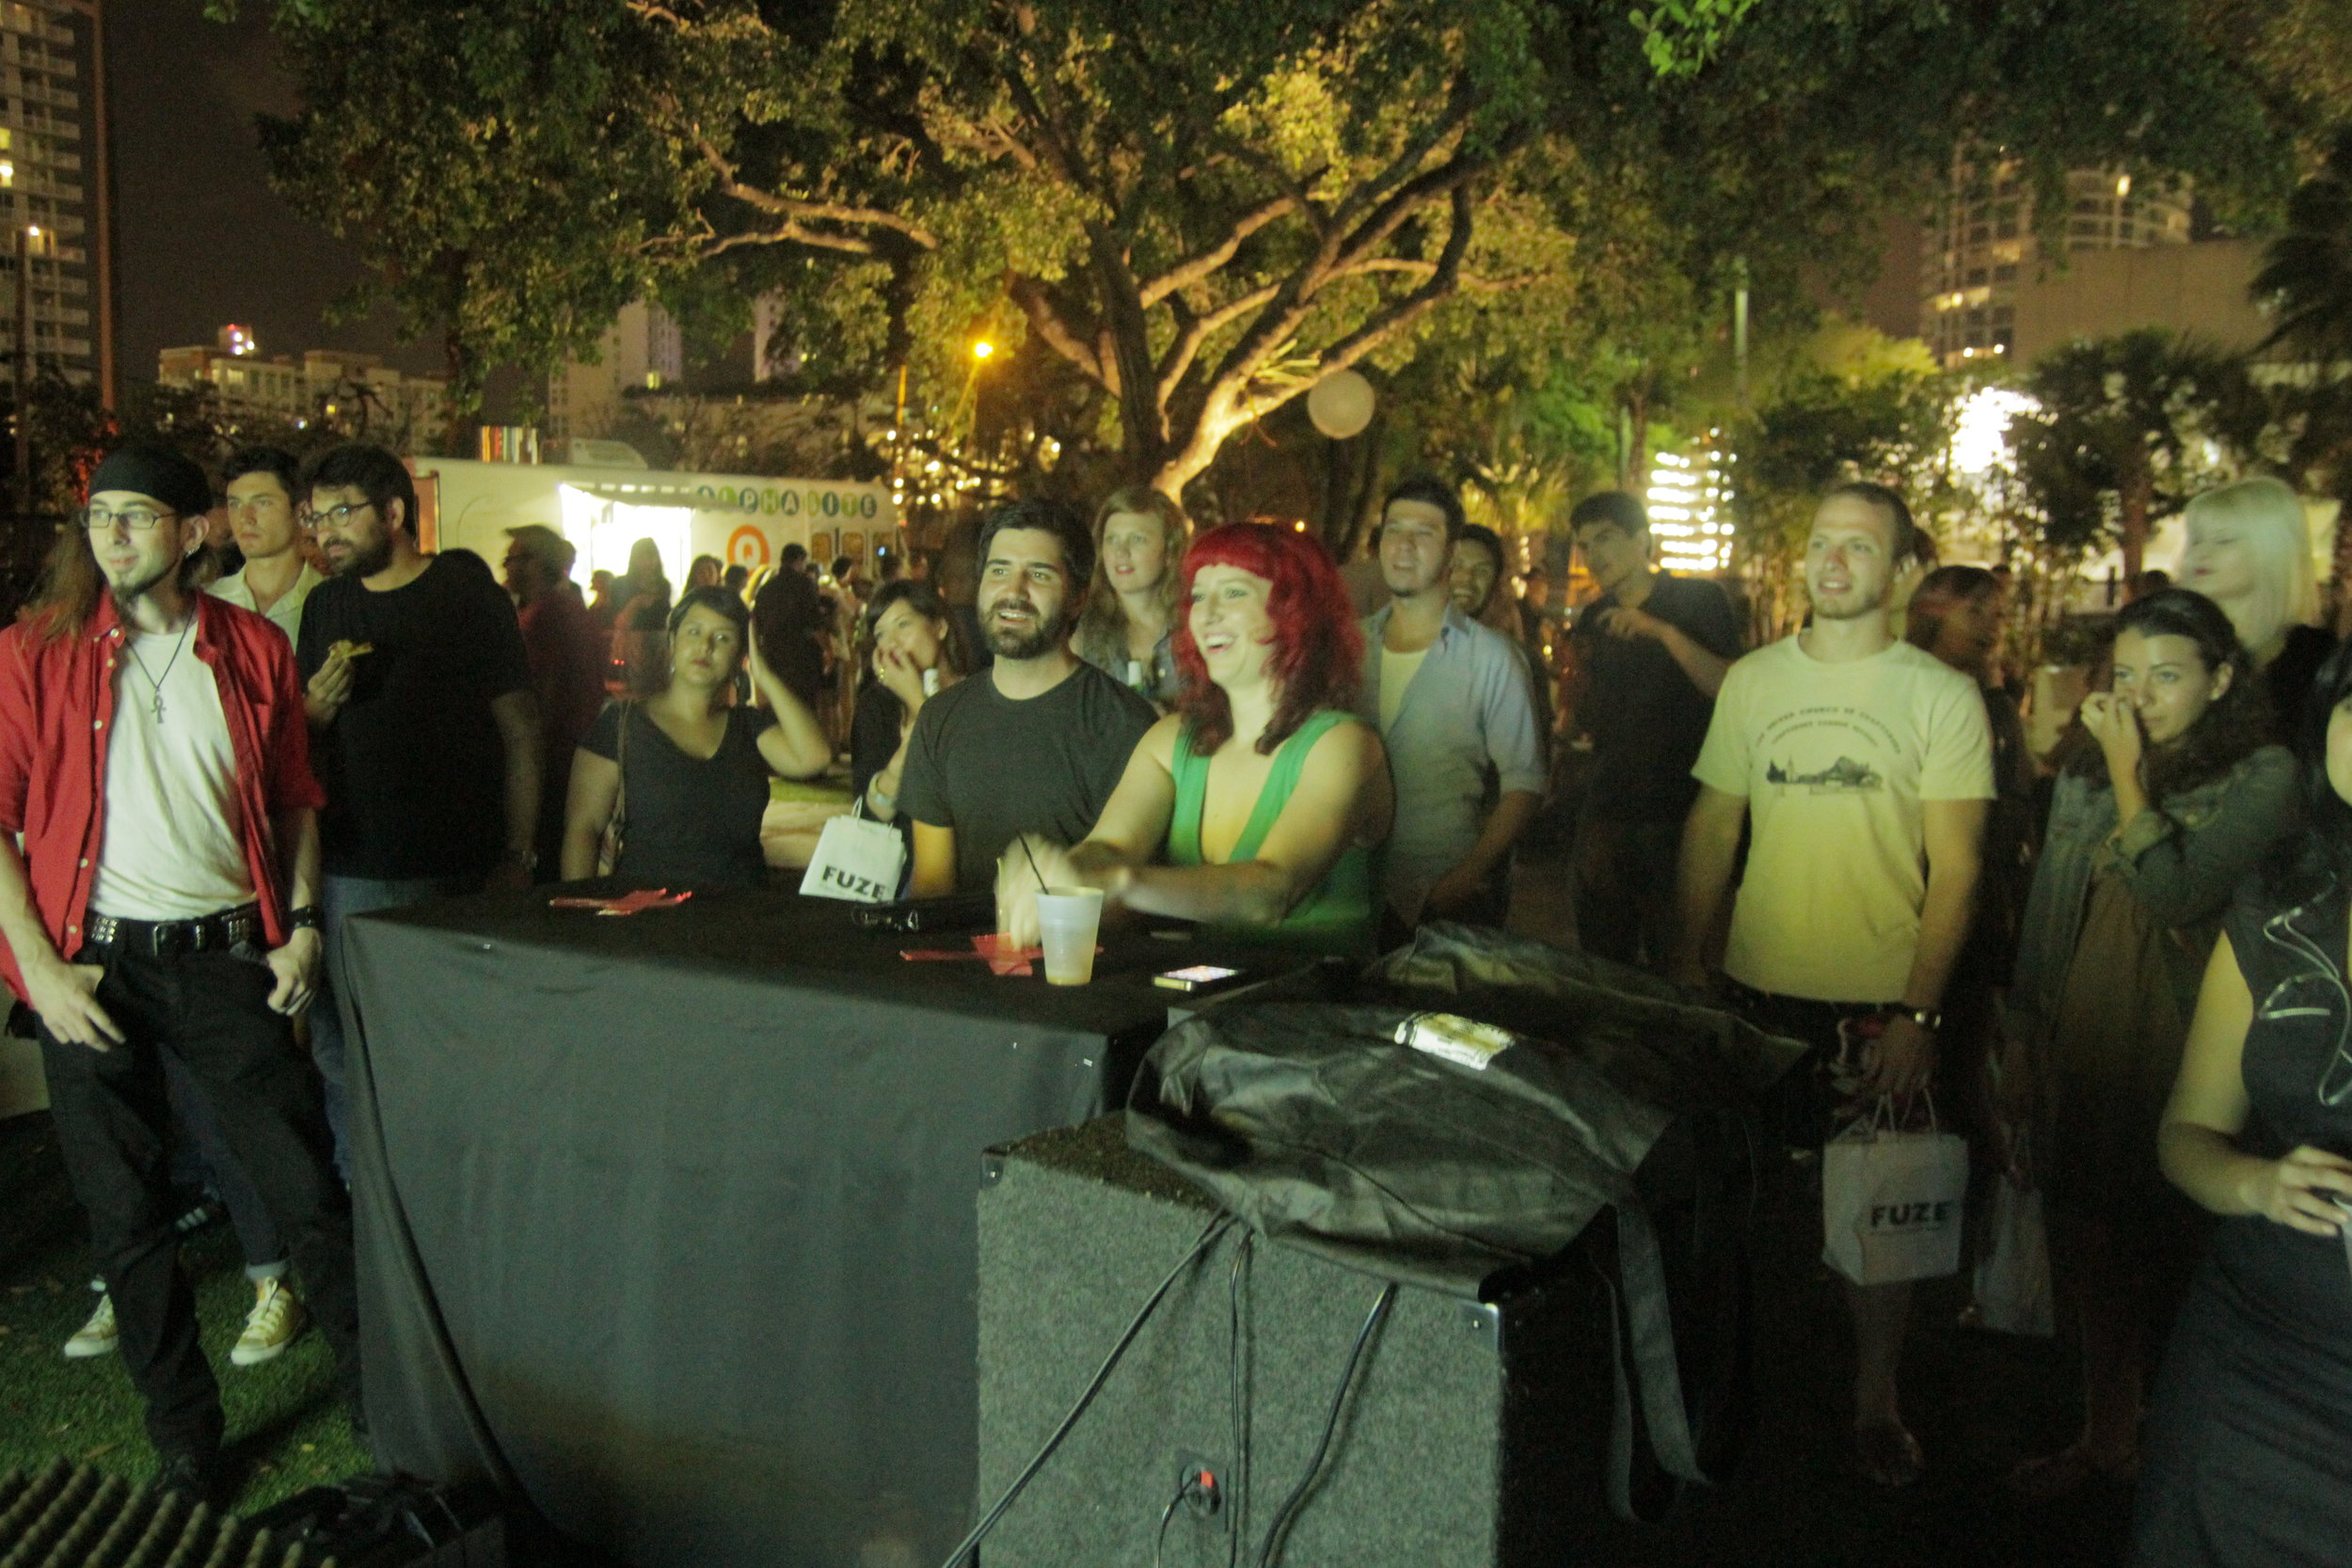 Borscht's Auris: Official After Party